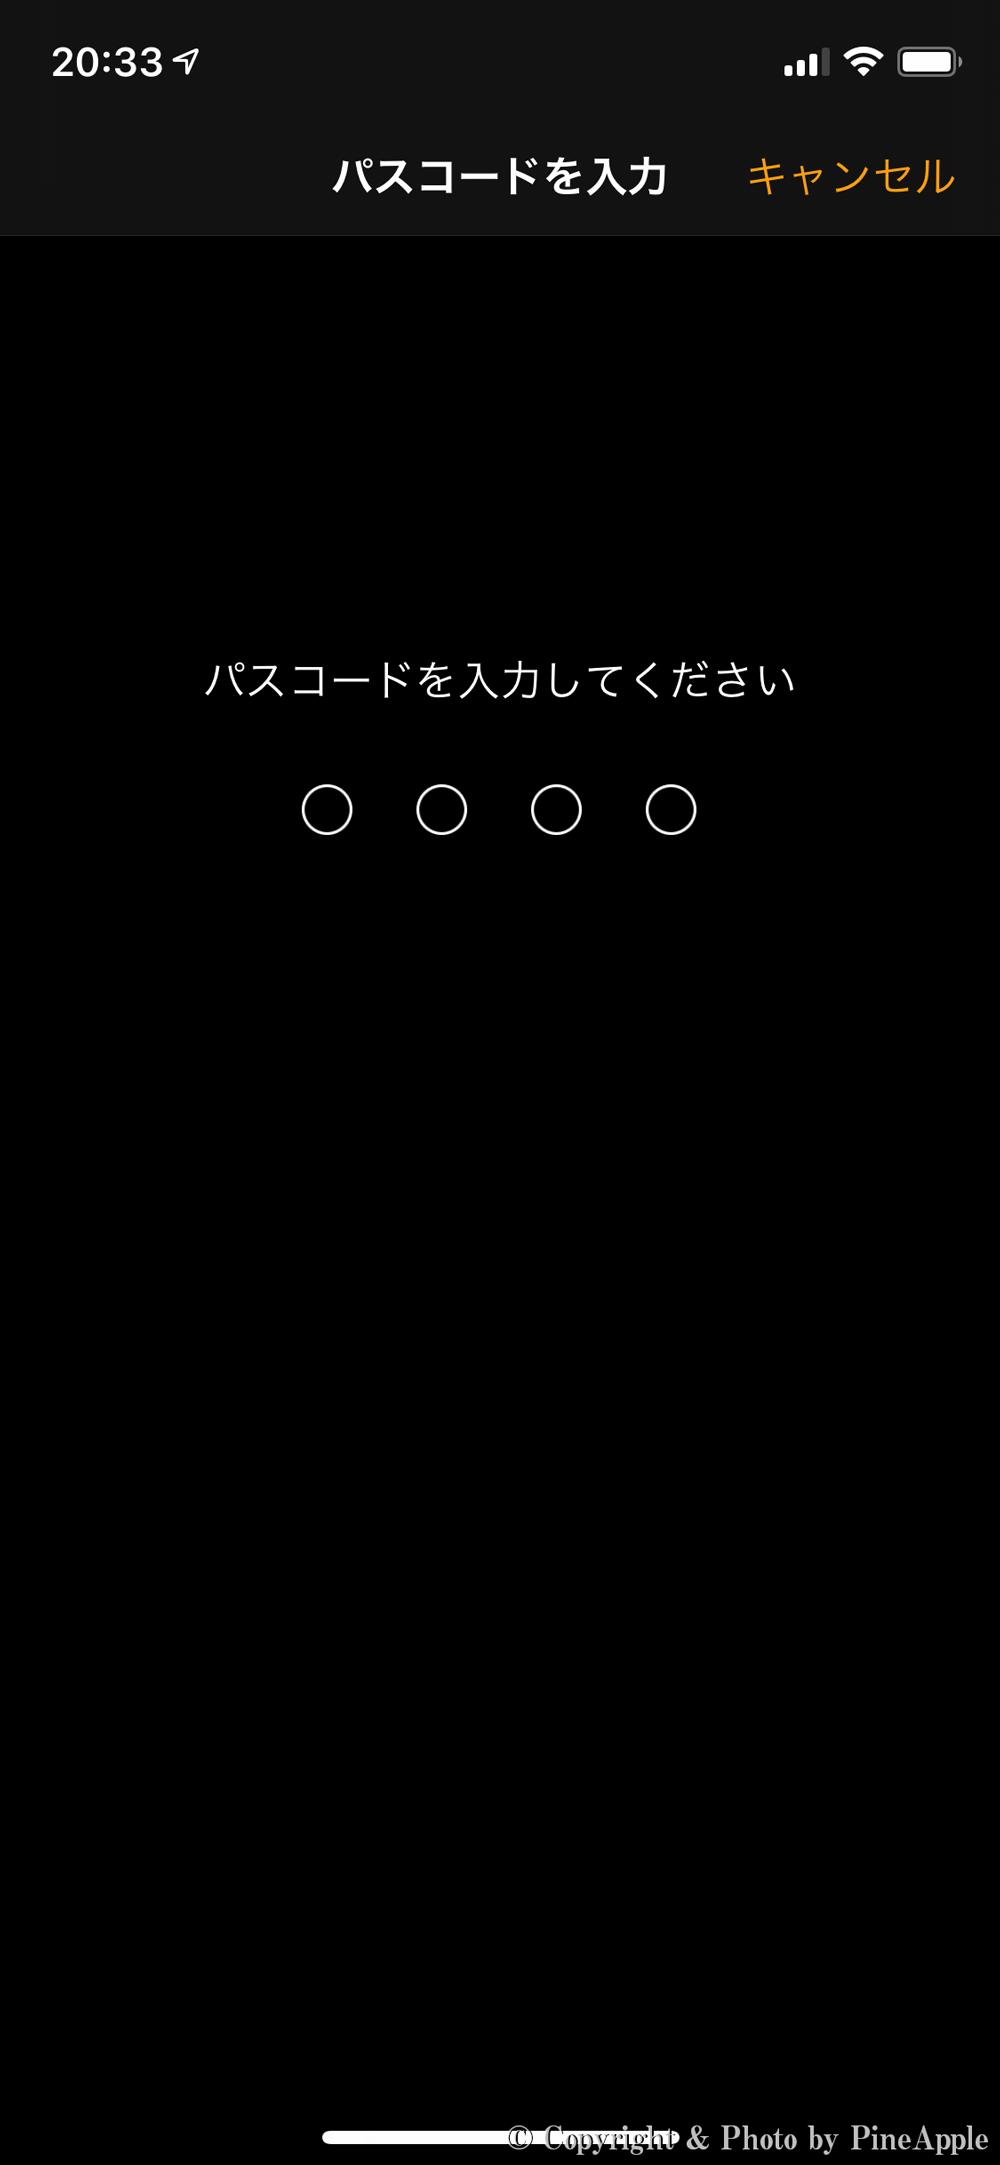 watchOS 6.1:パスコードを入力してください